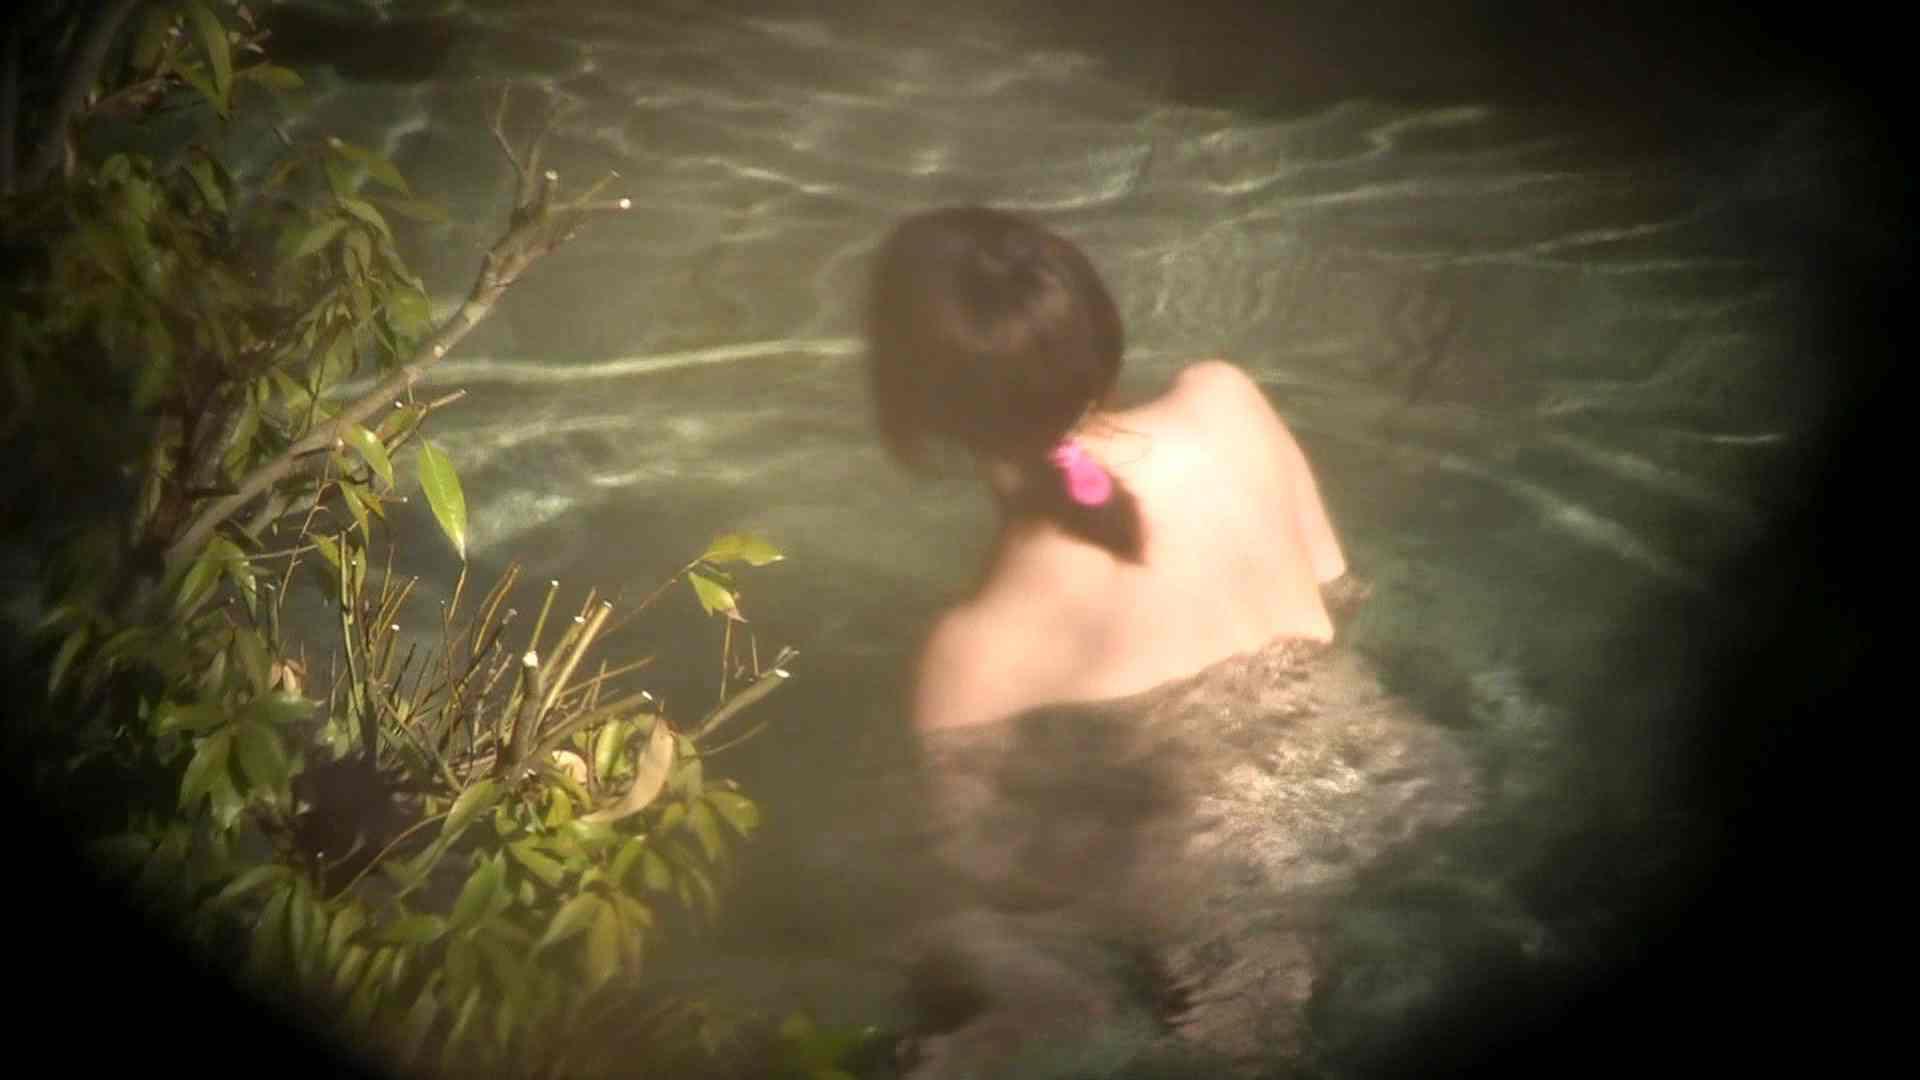 Aquaな露天風呂Vol.698 盗撮 | HなOL  86pic 36